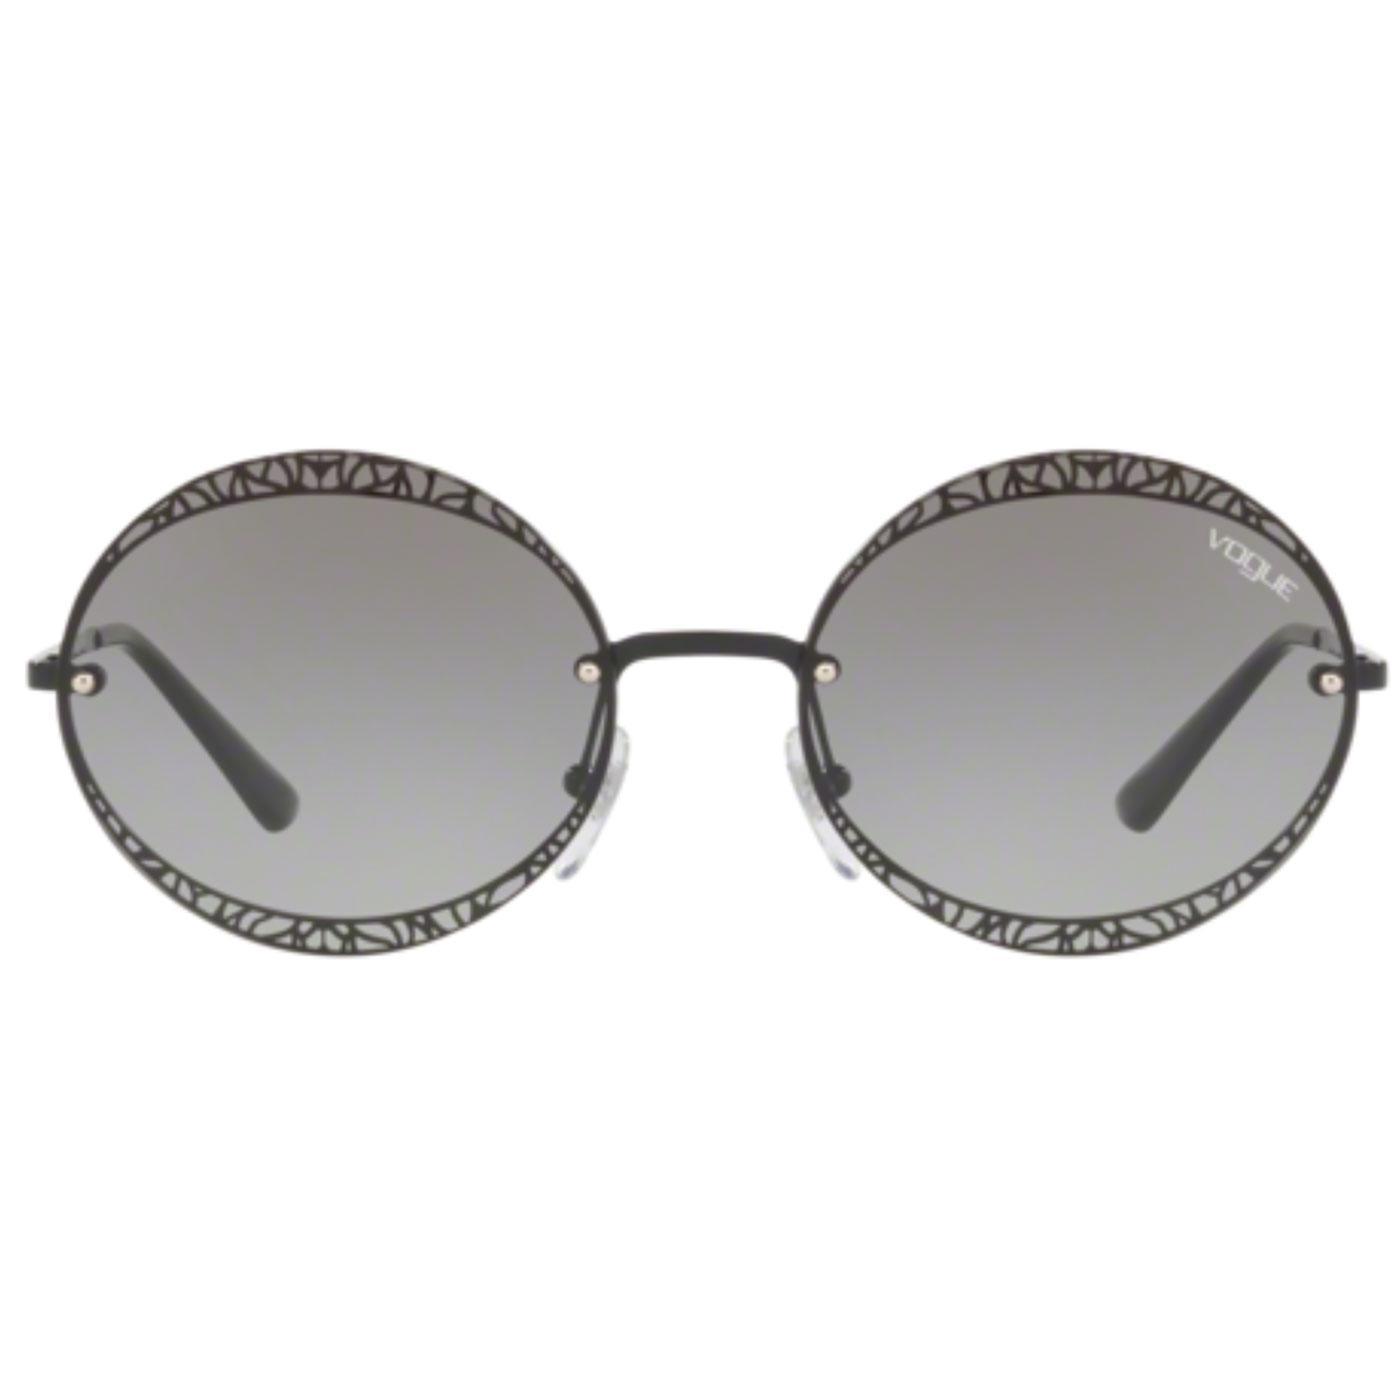 VOGUE Metallic Lace Retro Round Frame Sunglasses